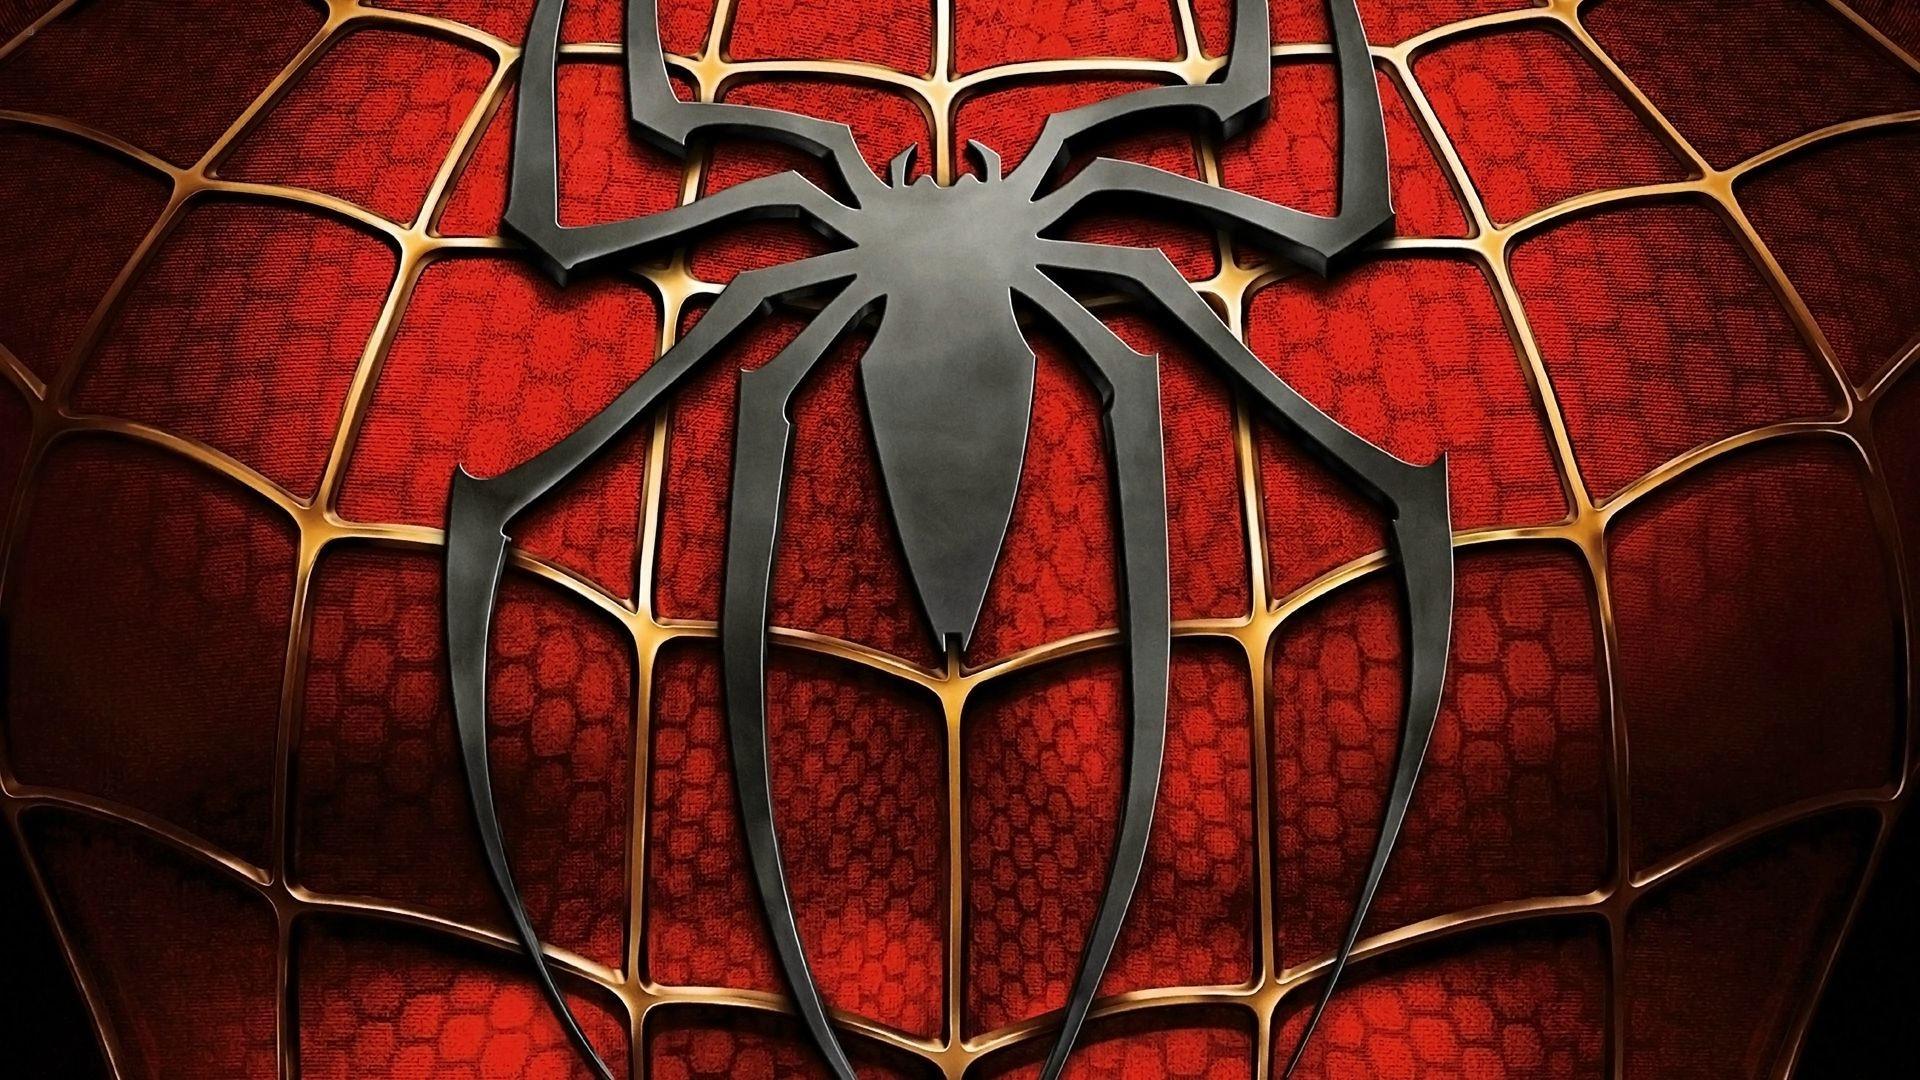 Spiderman Logo Wallpaper High Resolution 272 – HD Wallpapers Site